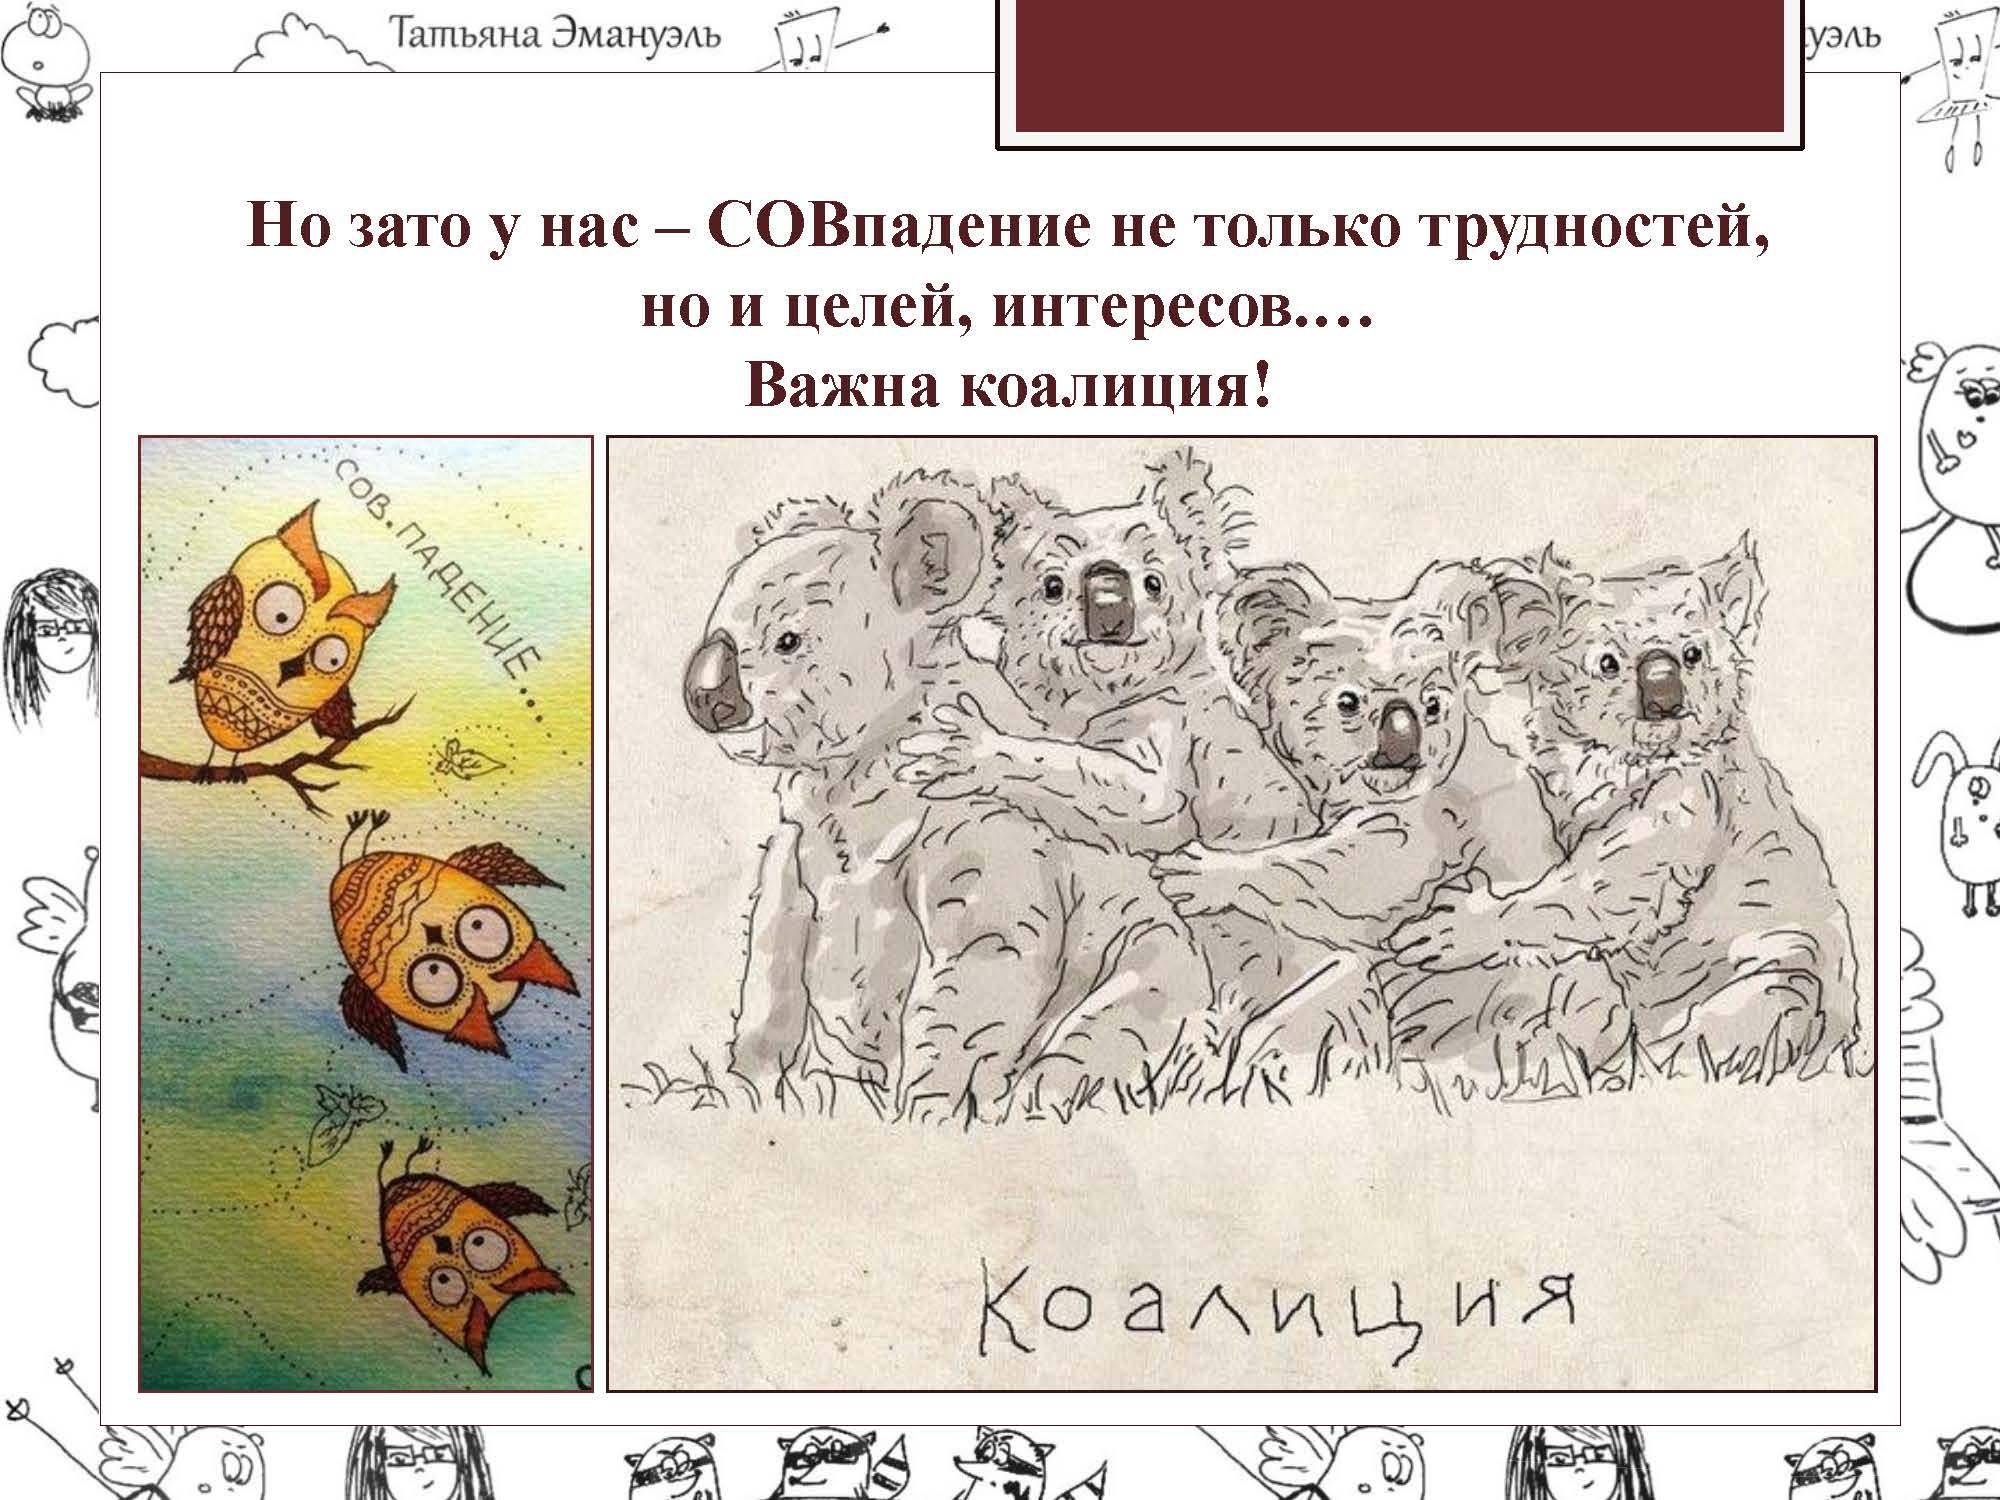 06 февраля эмануэль_Страница_119